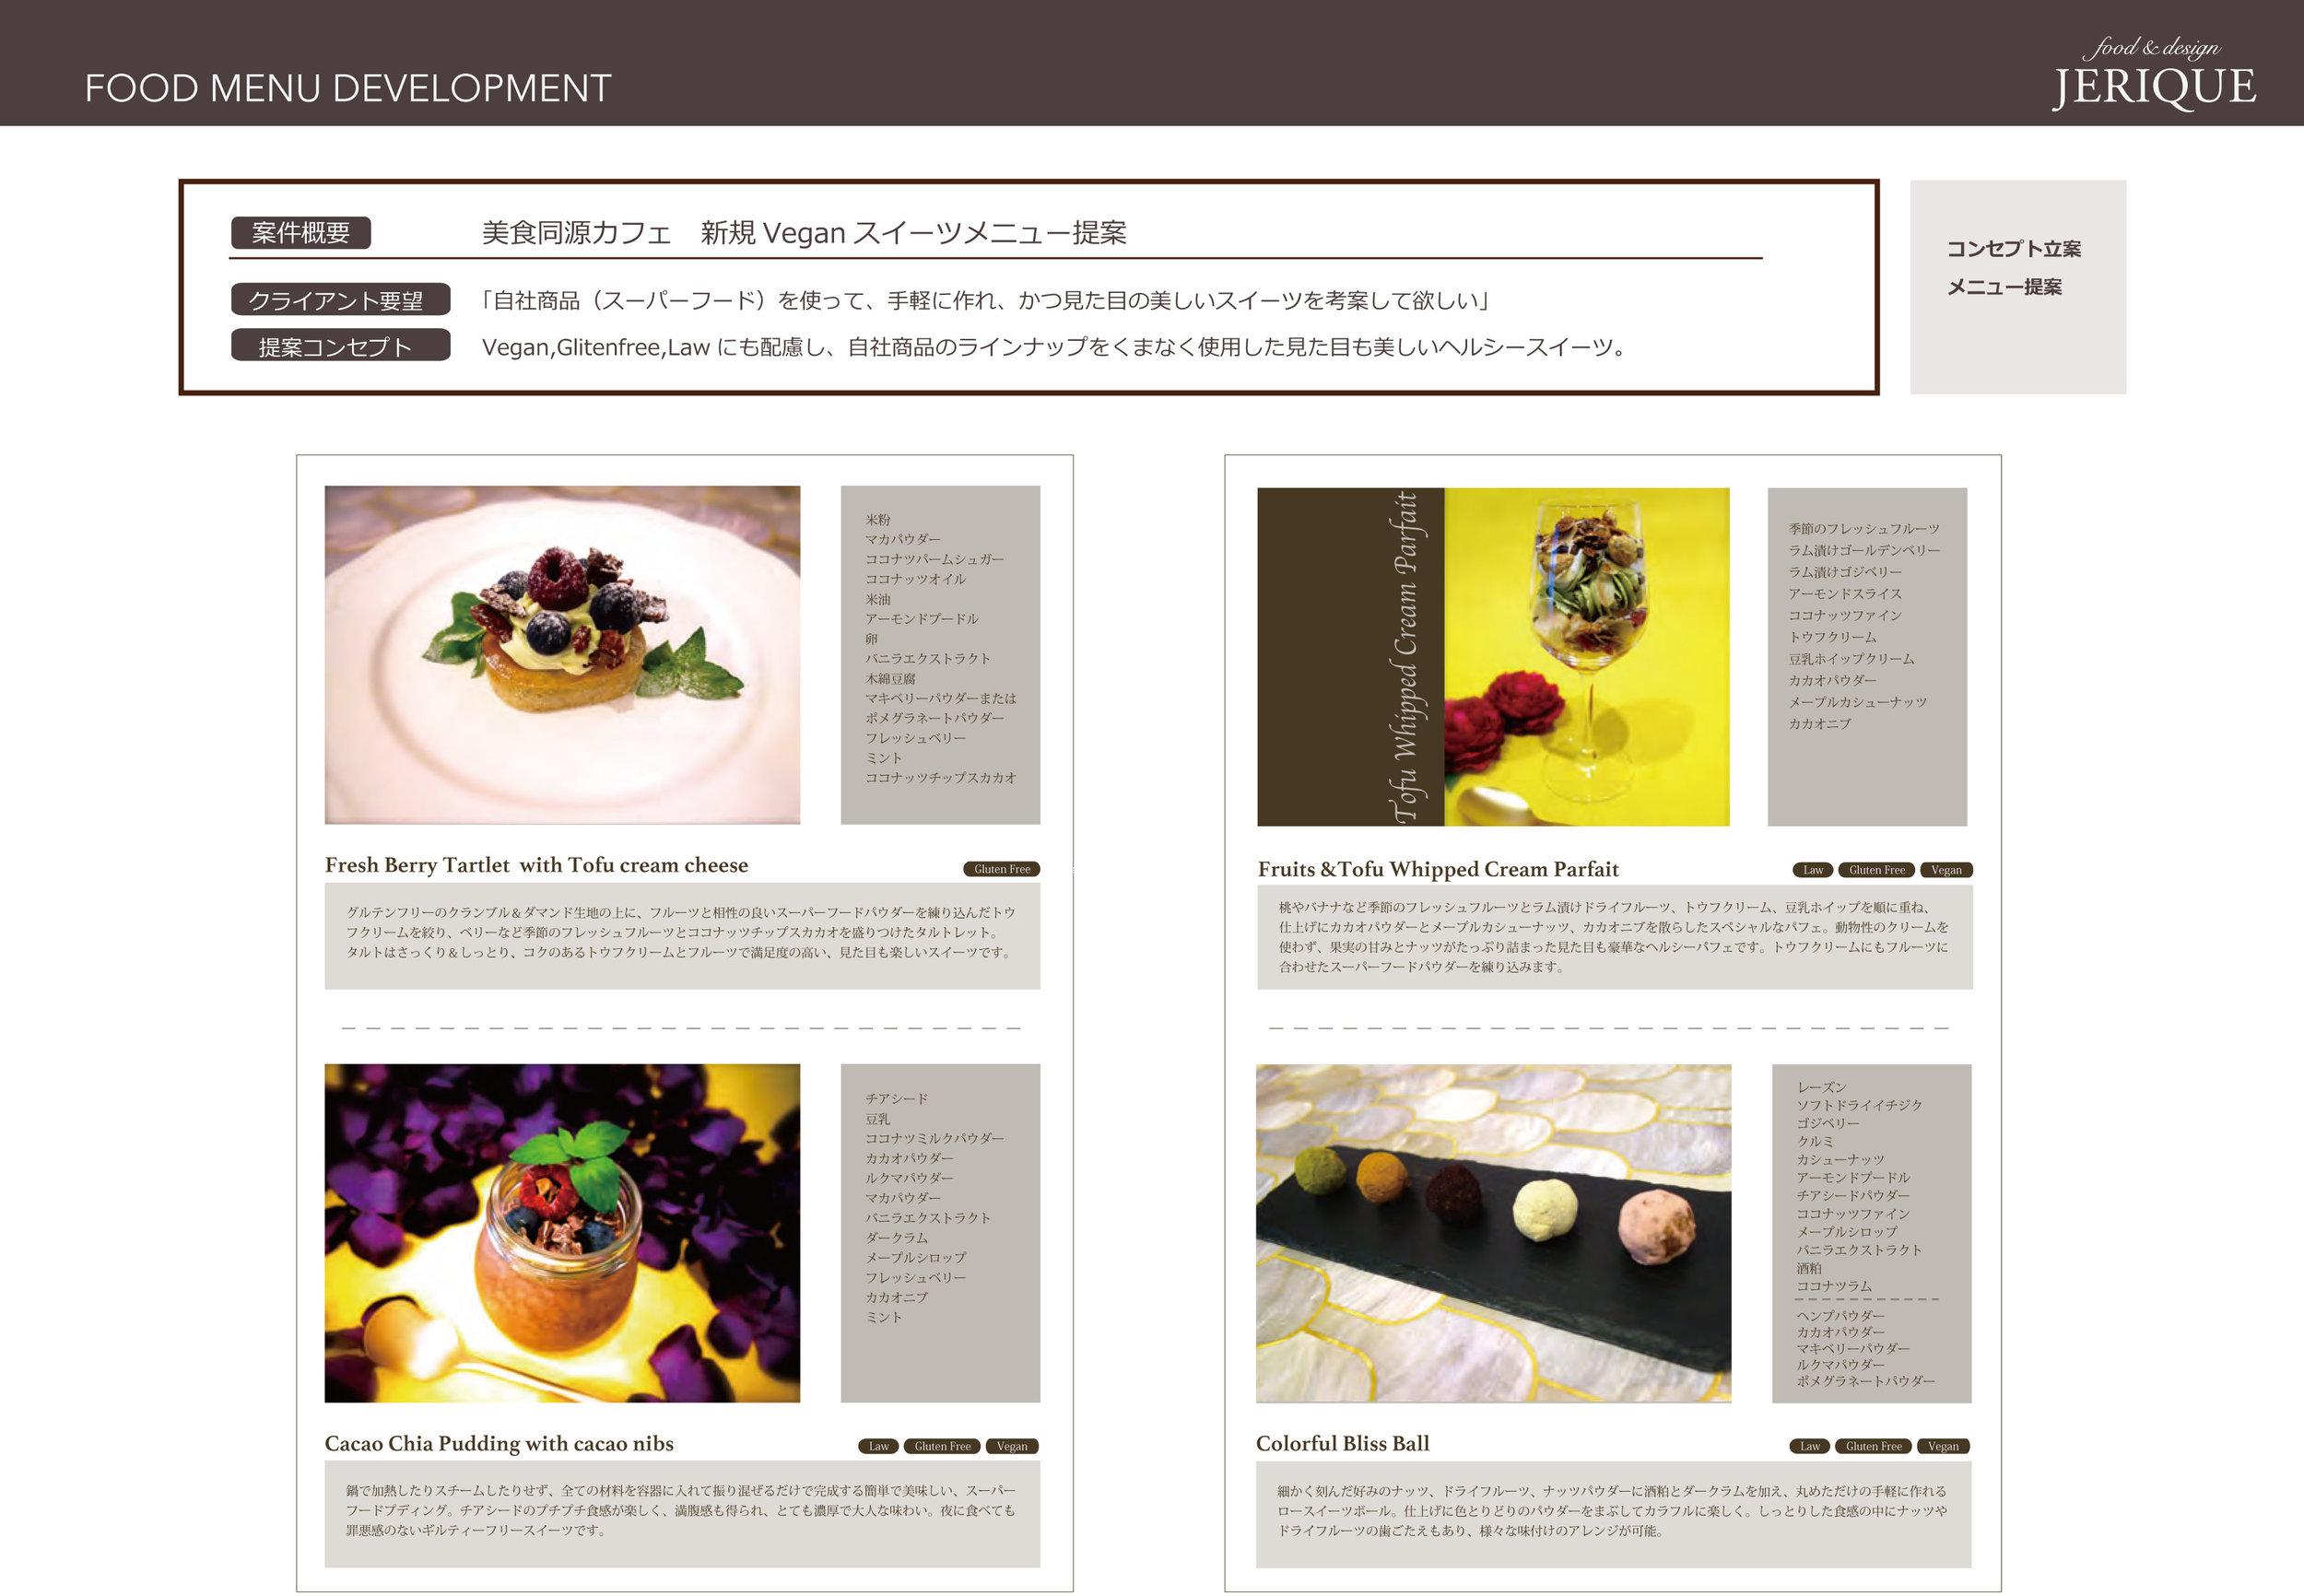 JERIQUE_FOOD DEVELOPMENT-6.jpg